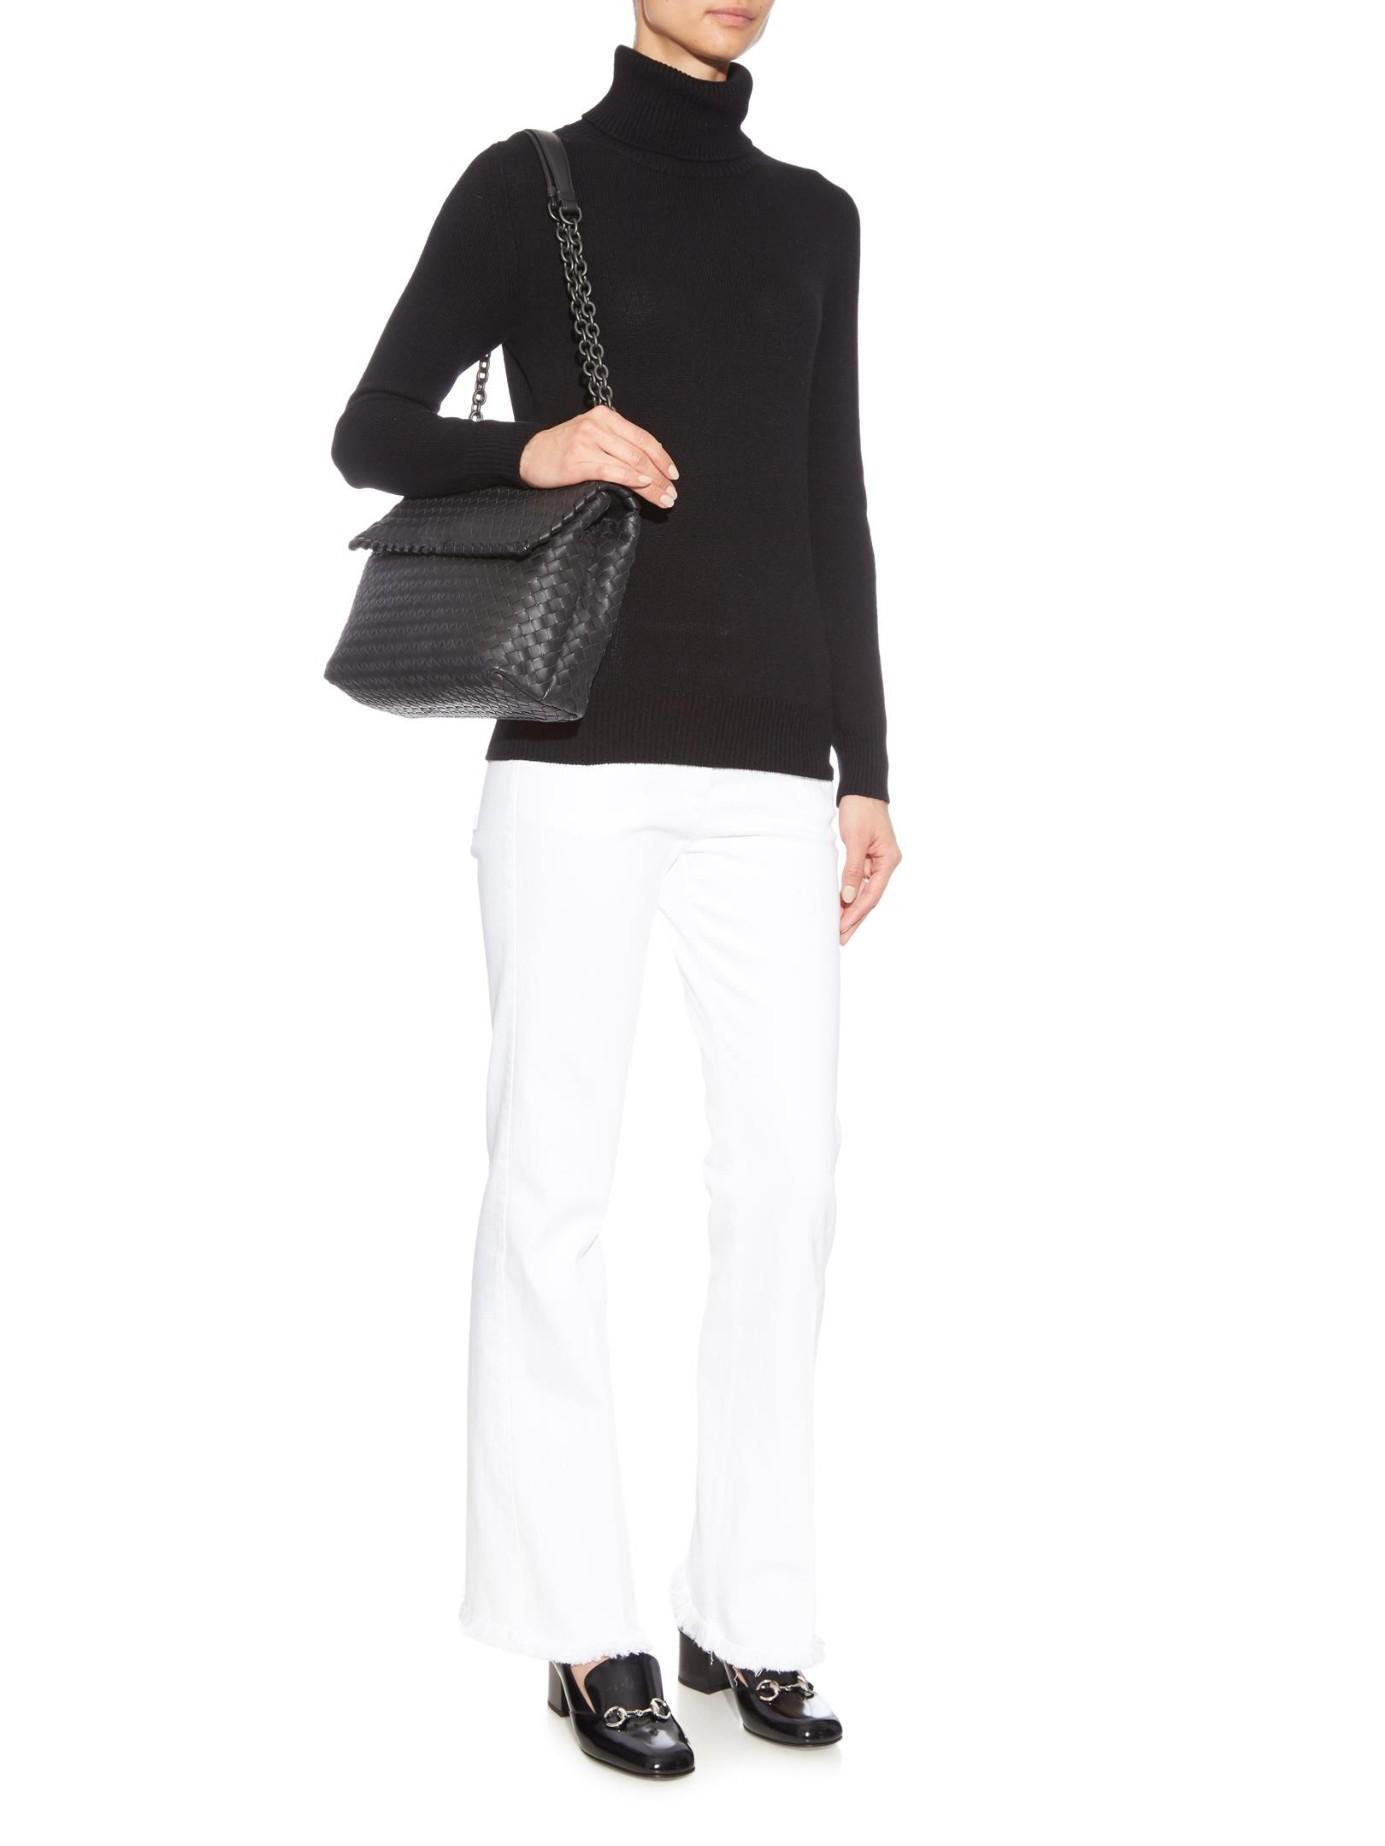 e84ea8bb867d Bottega Veneta Olympia Intrecciato Leather Shoulder Bag in Black - Lyst